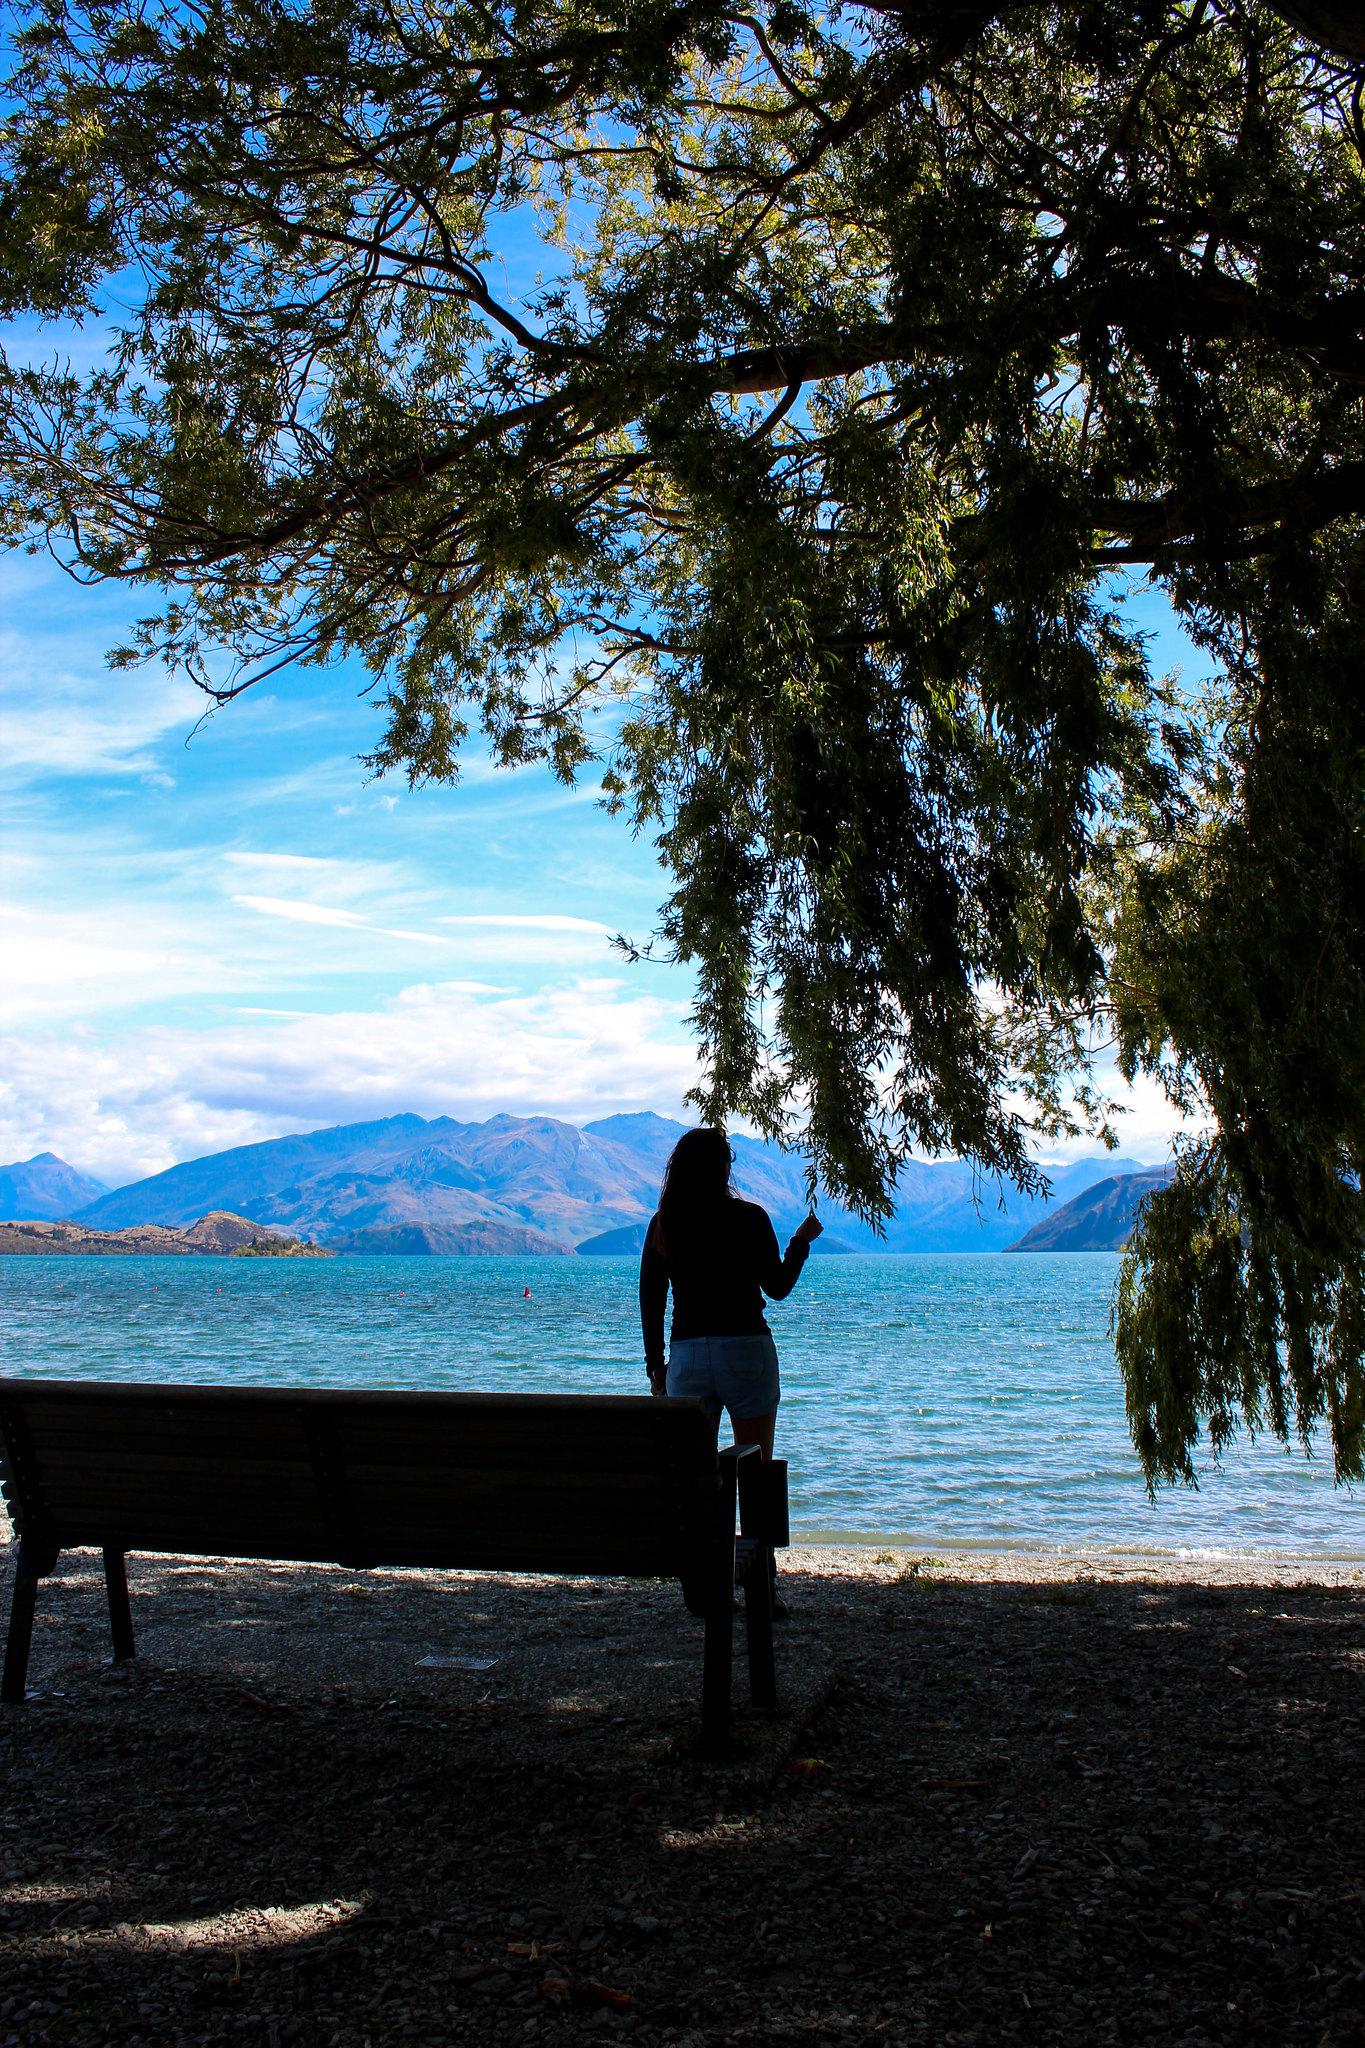 Wanaka Recreation Reserve (view of Lake Wanaka)